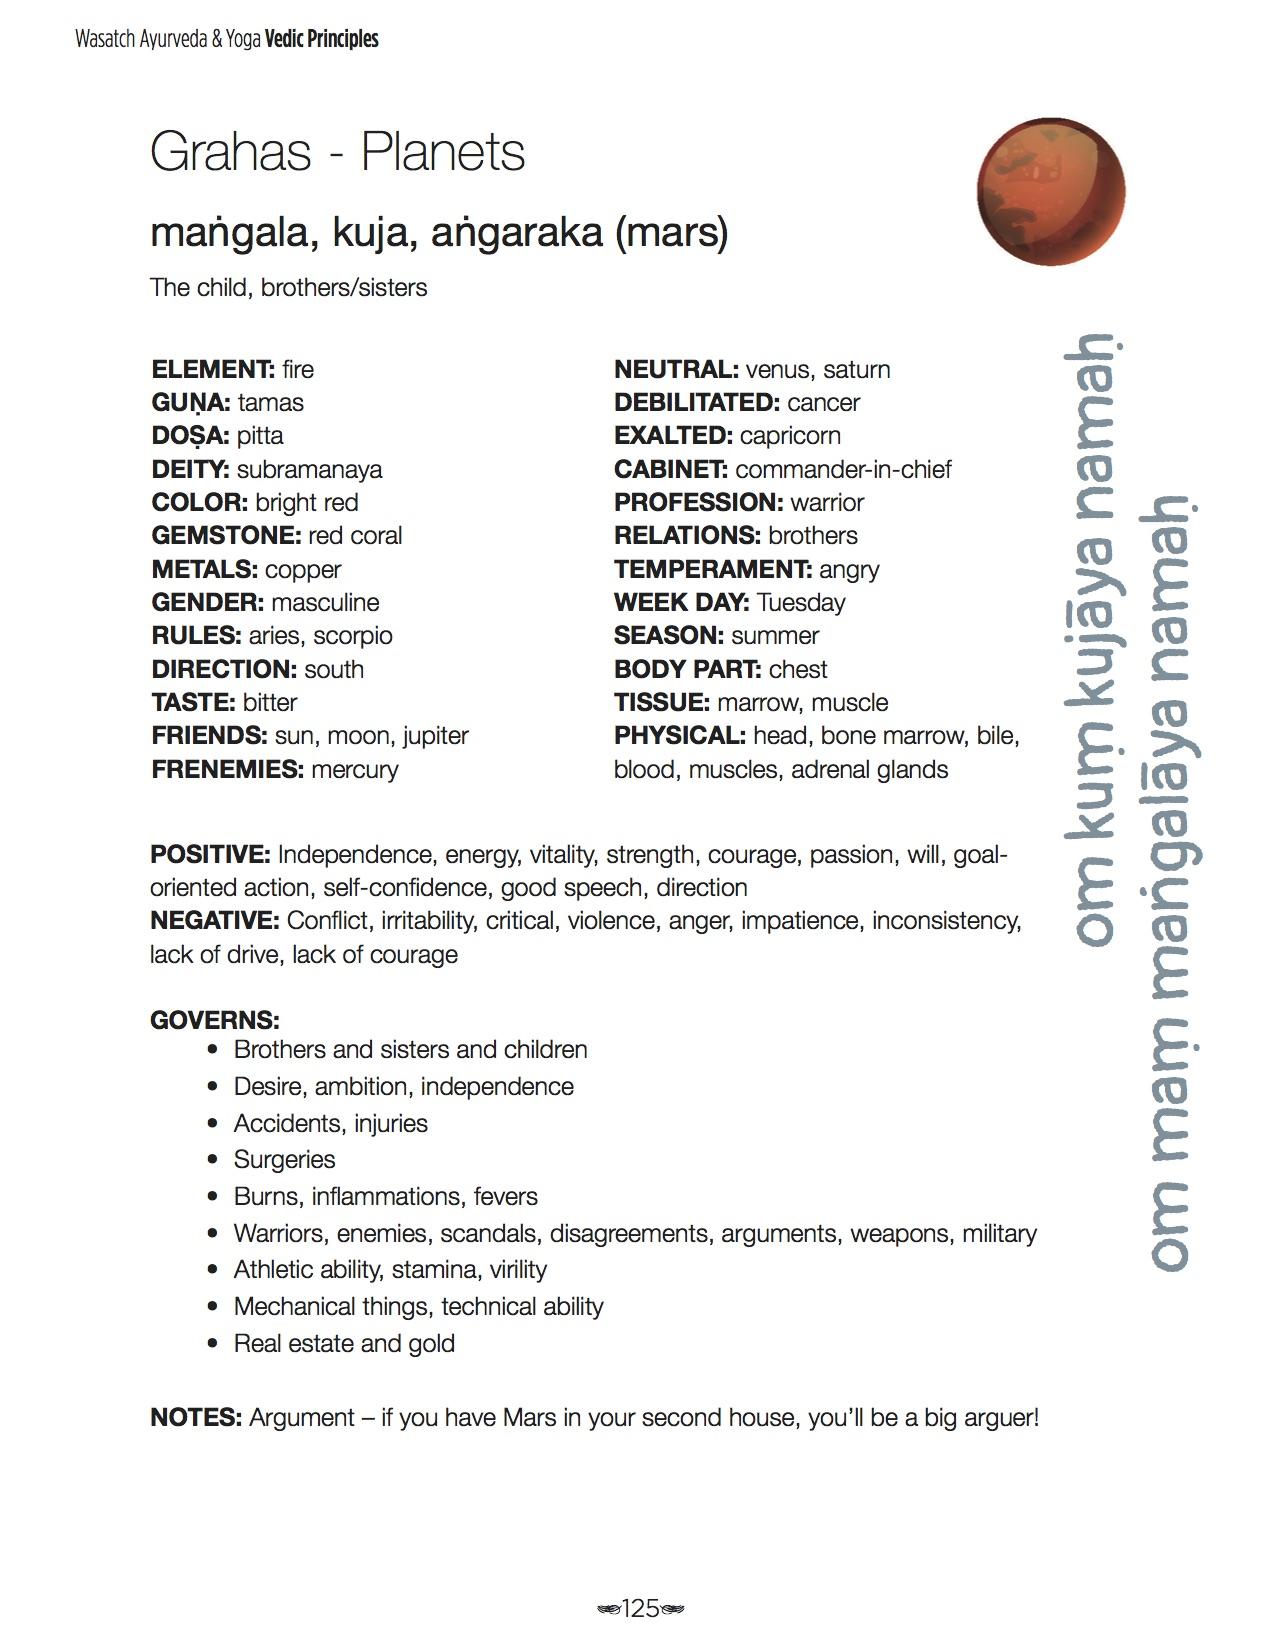 9 grahas mangala - Wasatch Ayurveda & Yoga